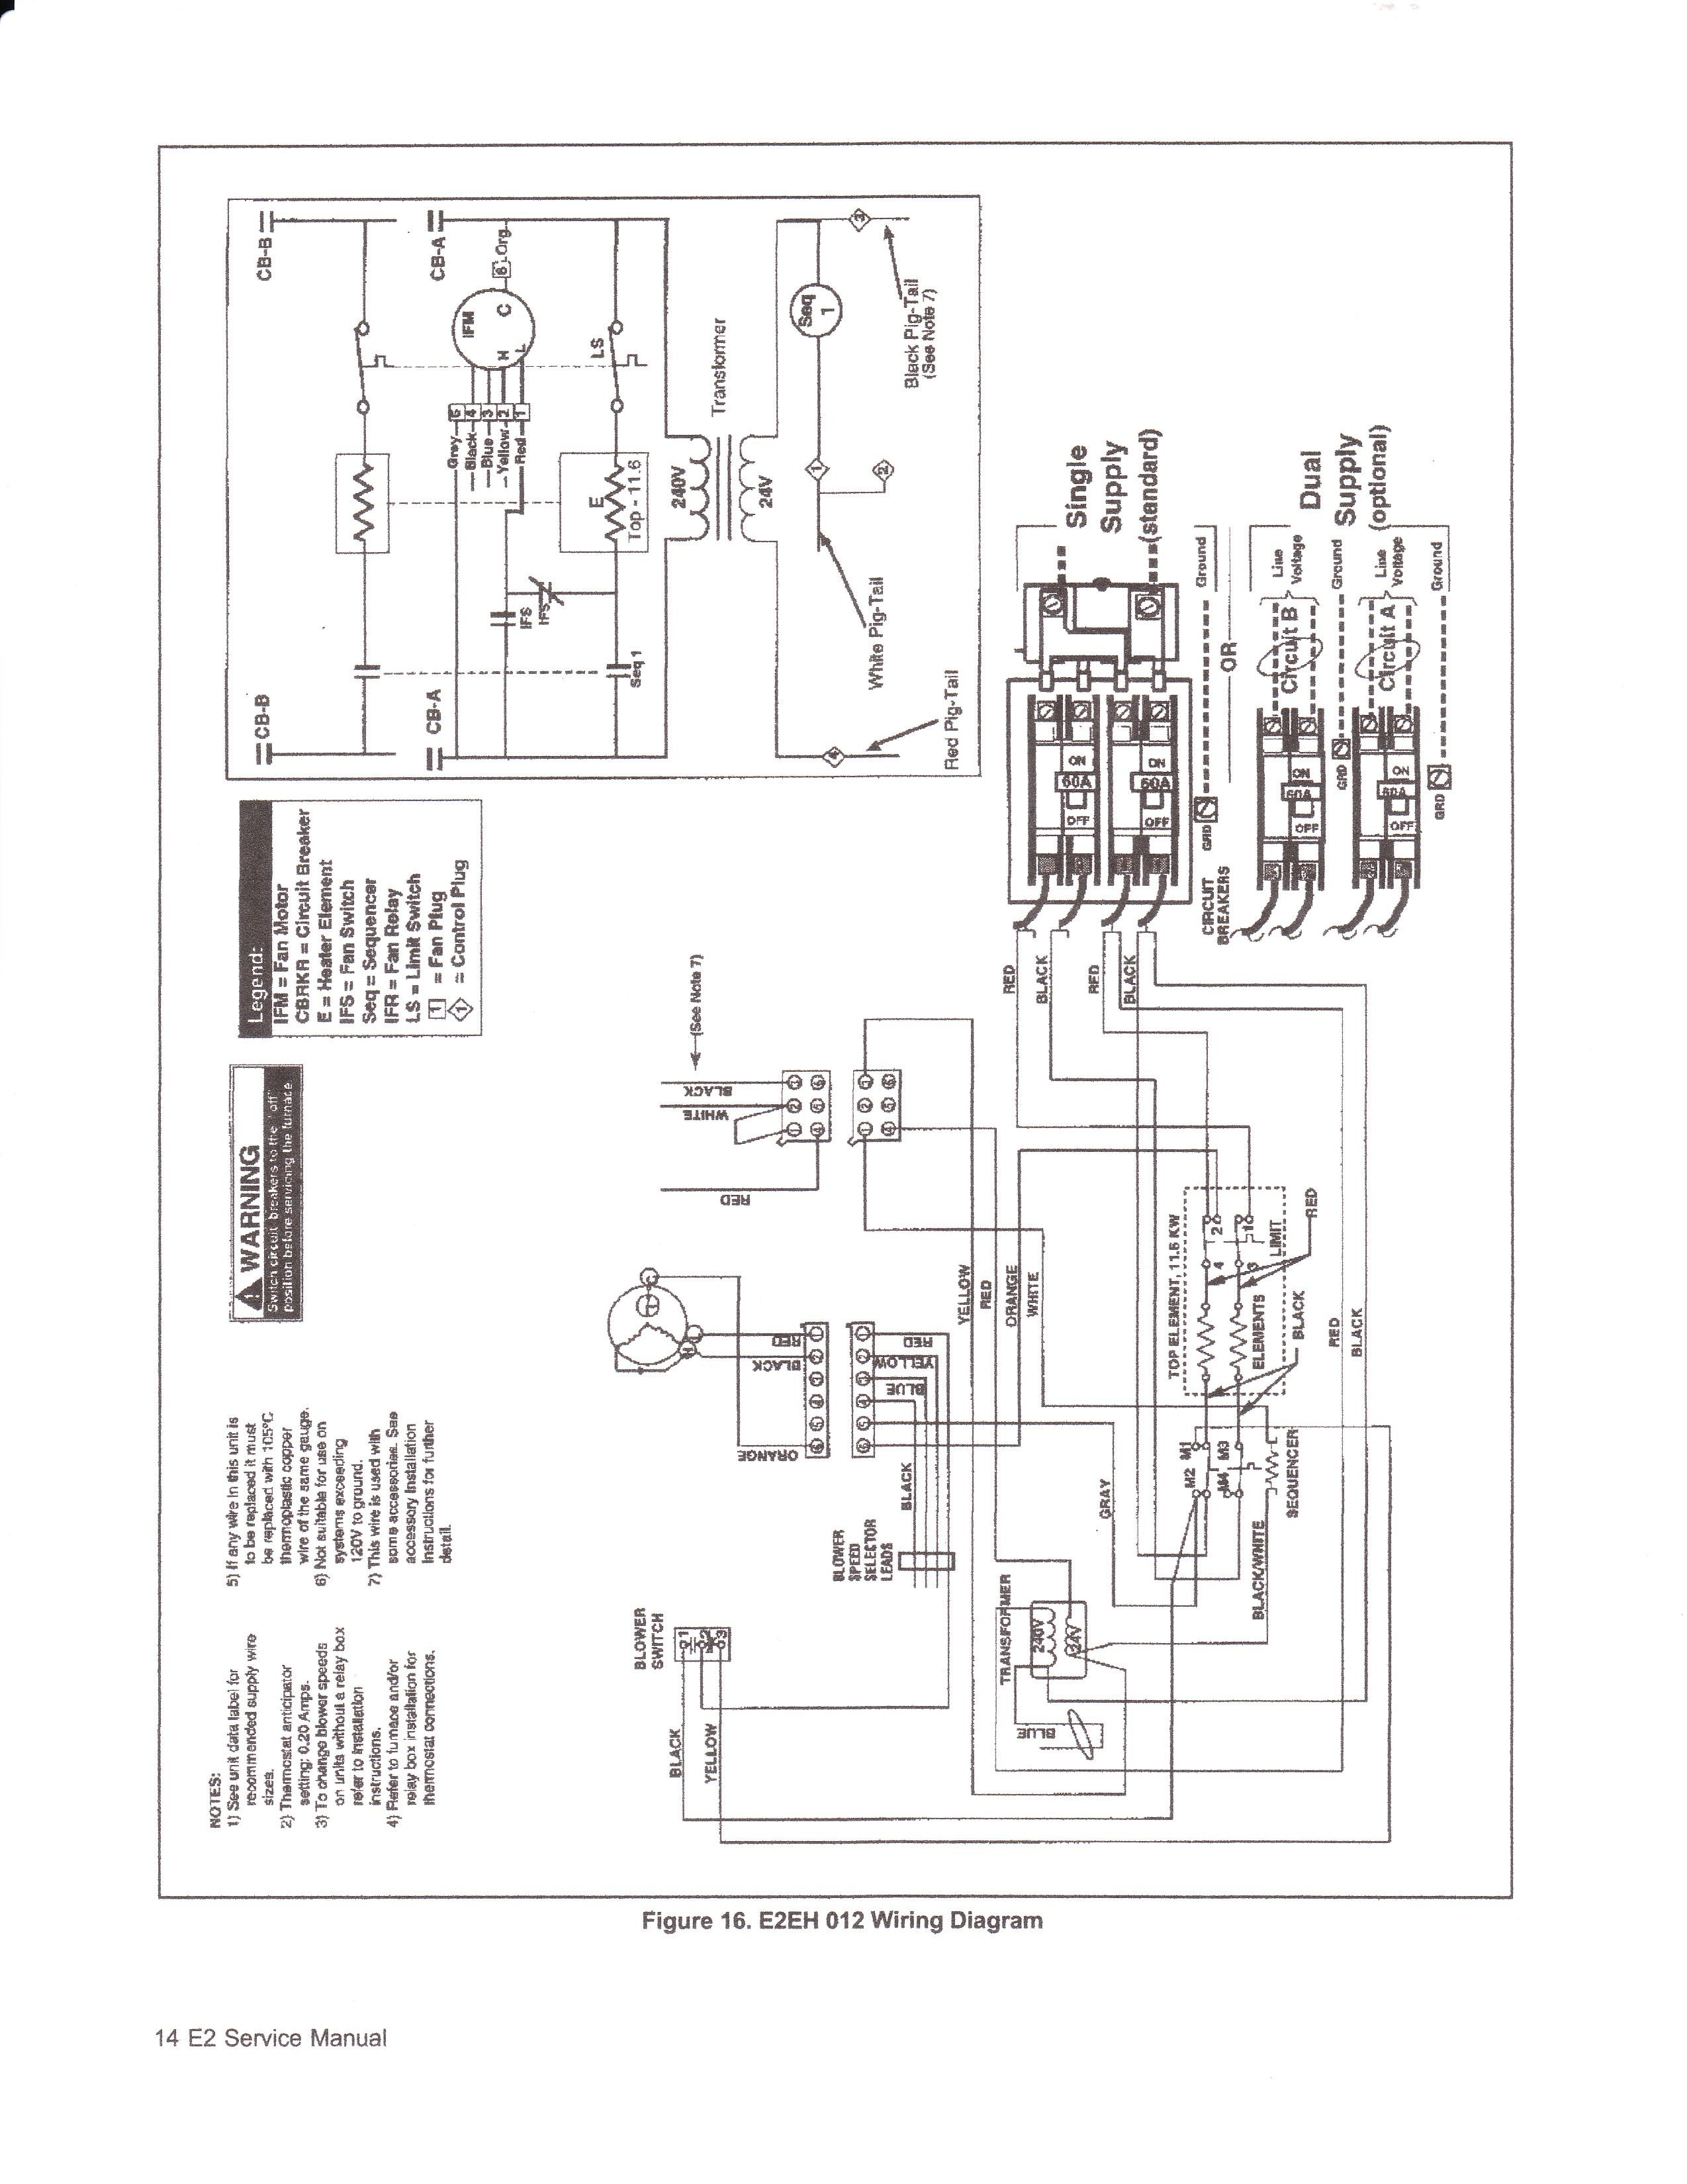 Nordyne Wiring Diagram Electric Furnace New Intertherm Electric Furnace Wiring Diagram for nordyne Heat Pump